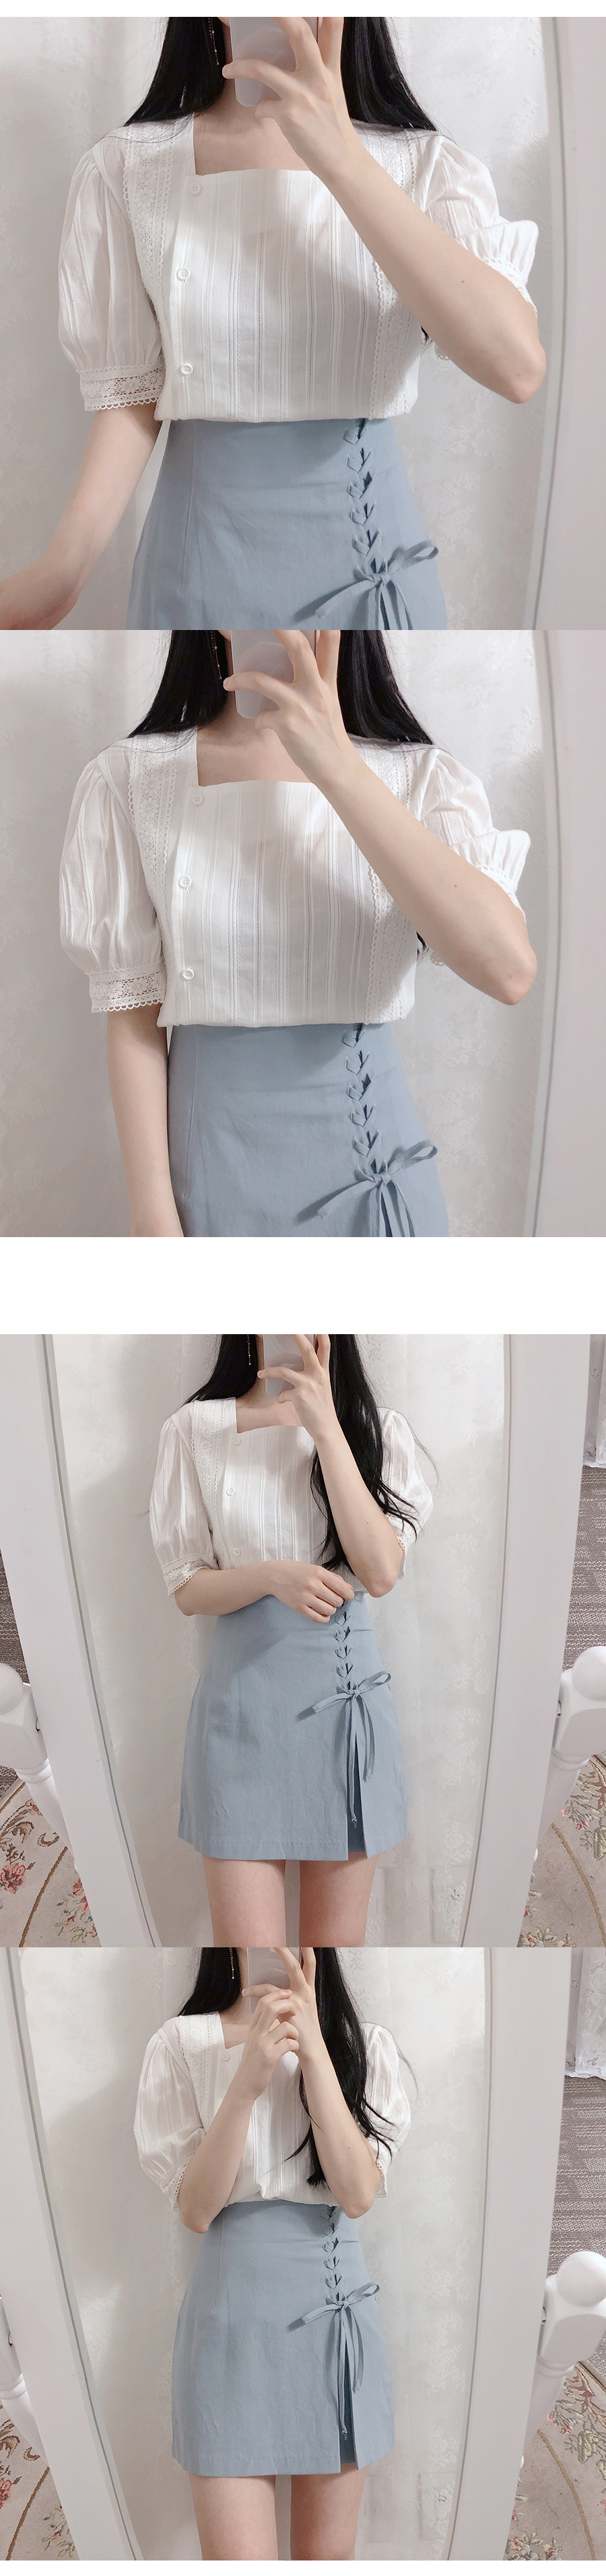 Liang Square race blouse